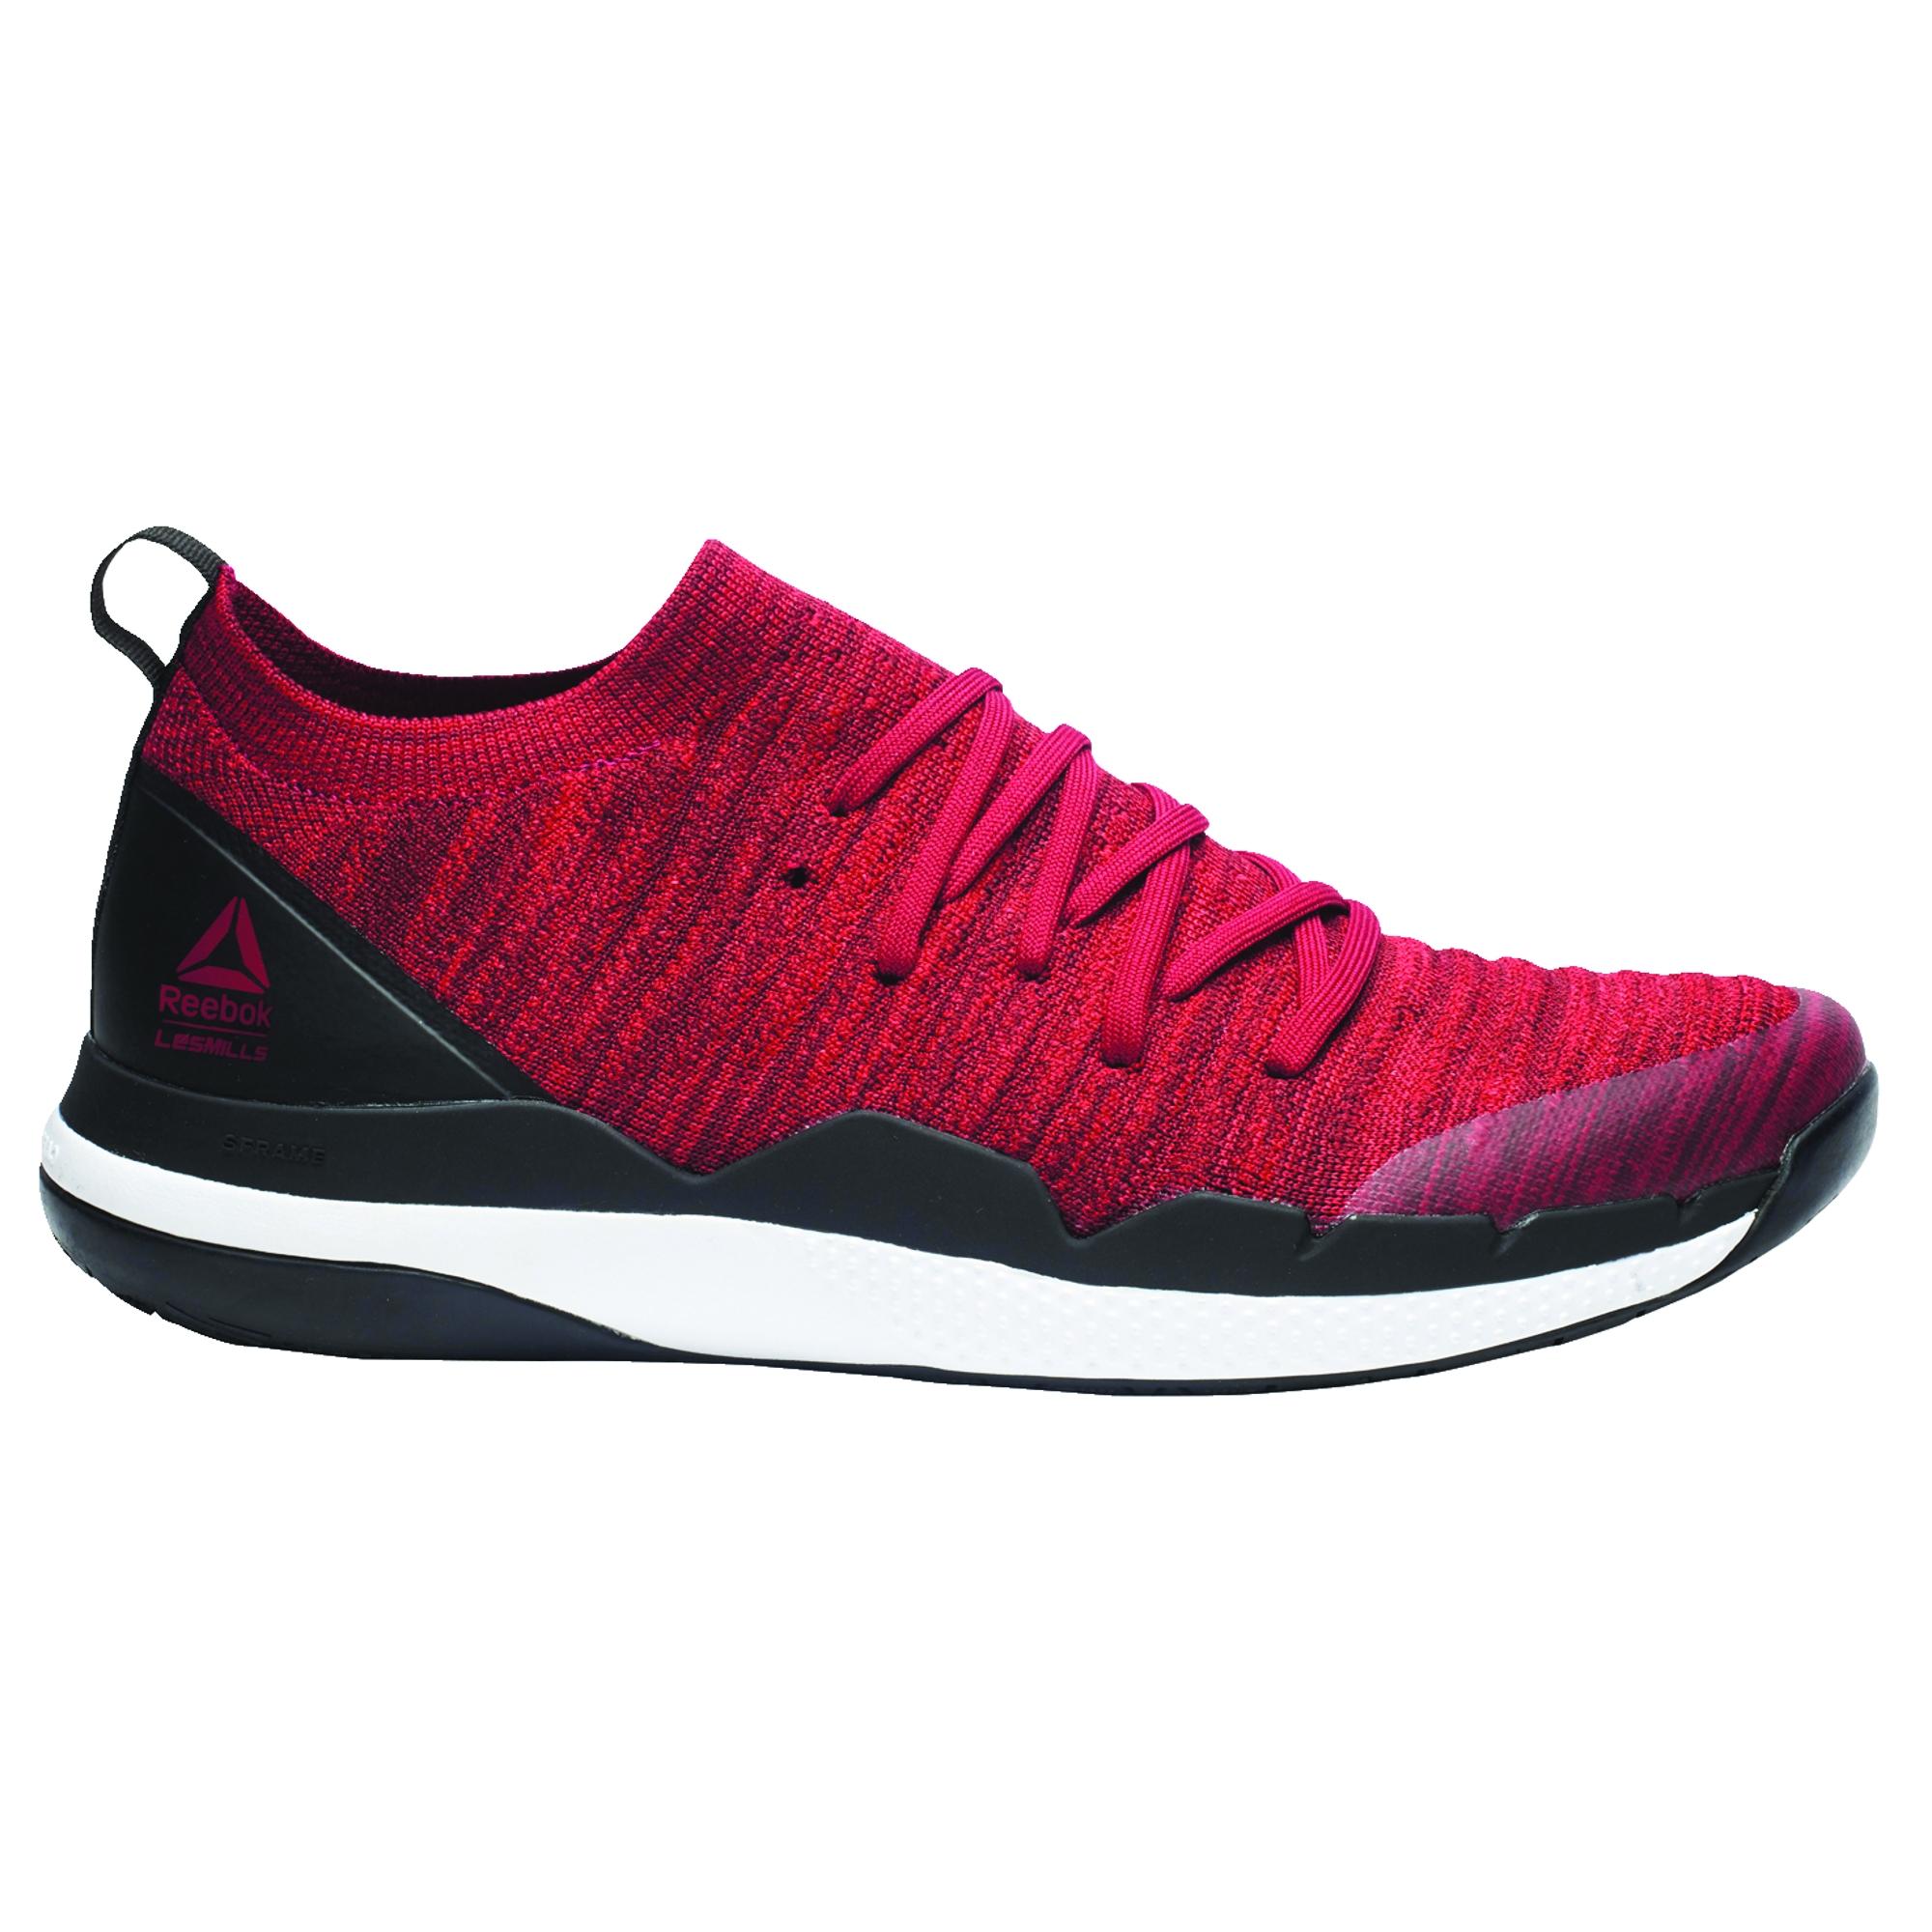 Chaussures Reebok Ultra Circuit training Ultraknit Les Mills ... bef7dae2d7